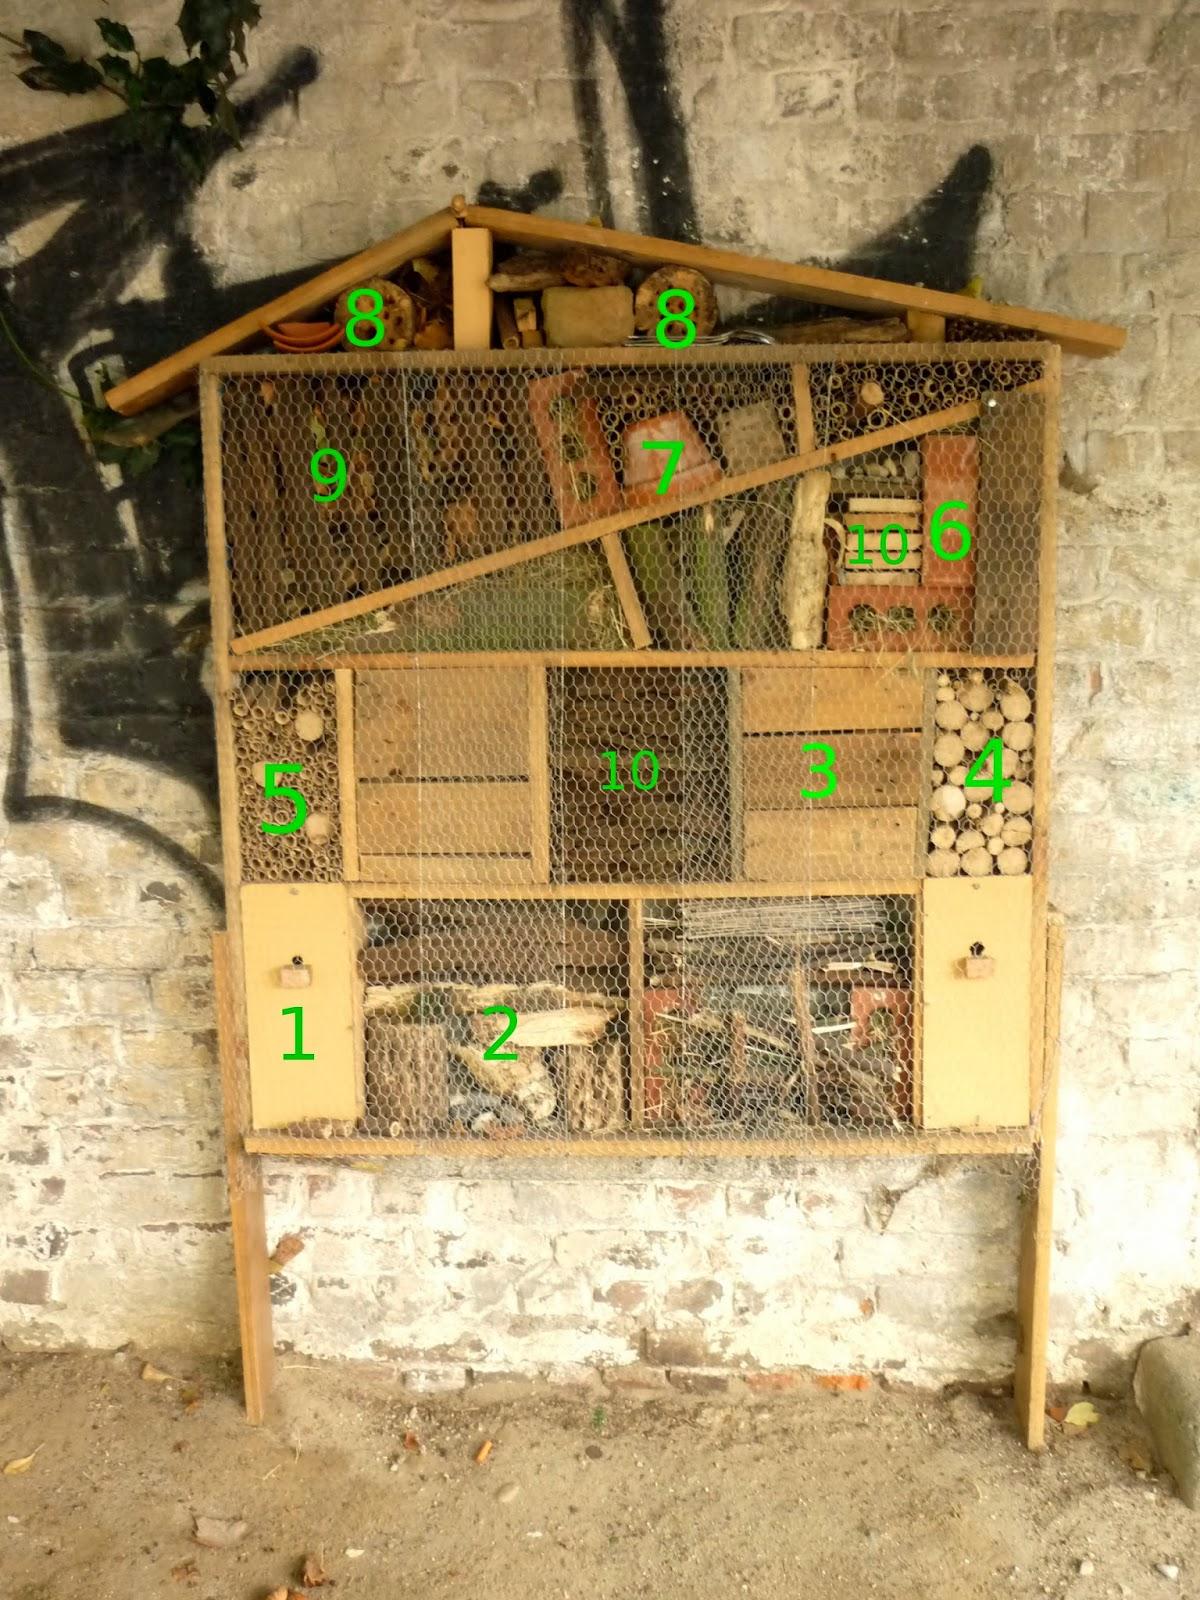 tr s construire une maison a insecte ri82 montrealeast. Black Bedroom Furniture Sets. Home Design Ideas